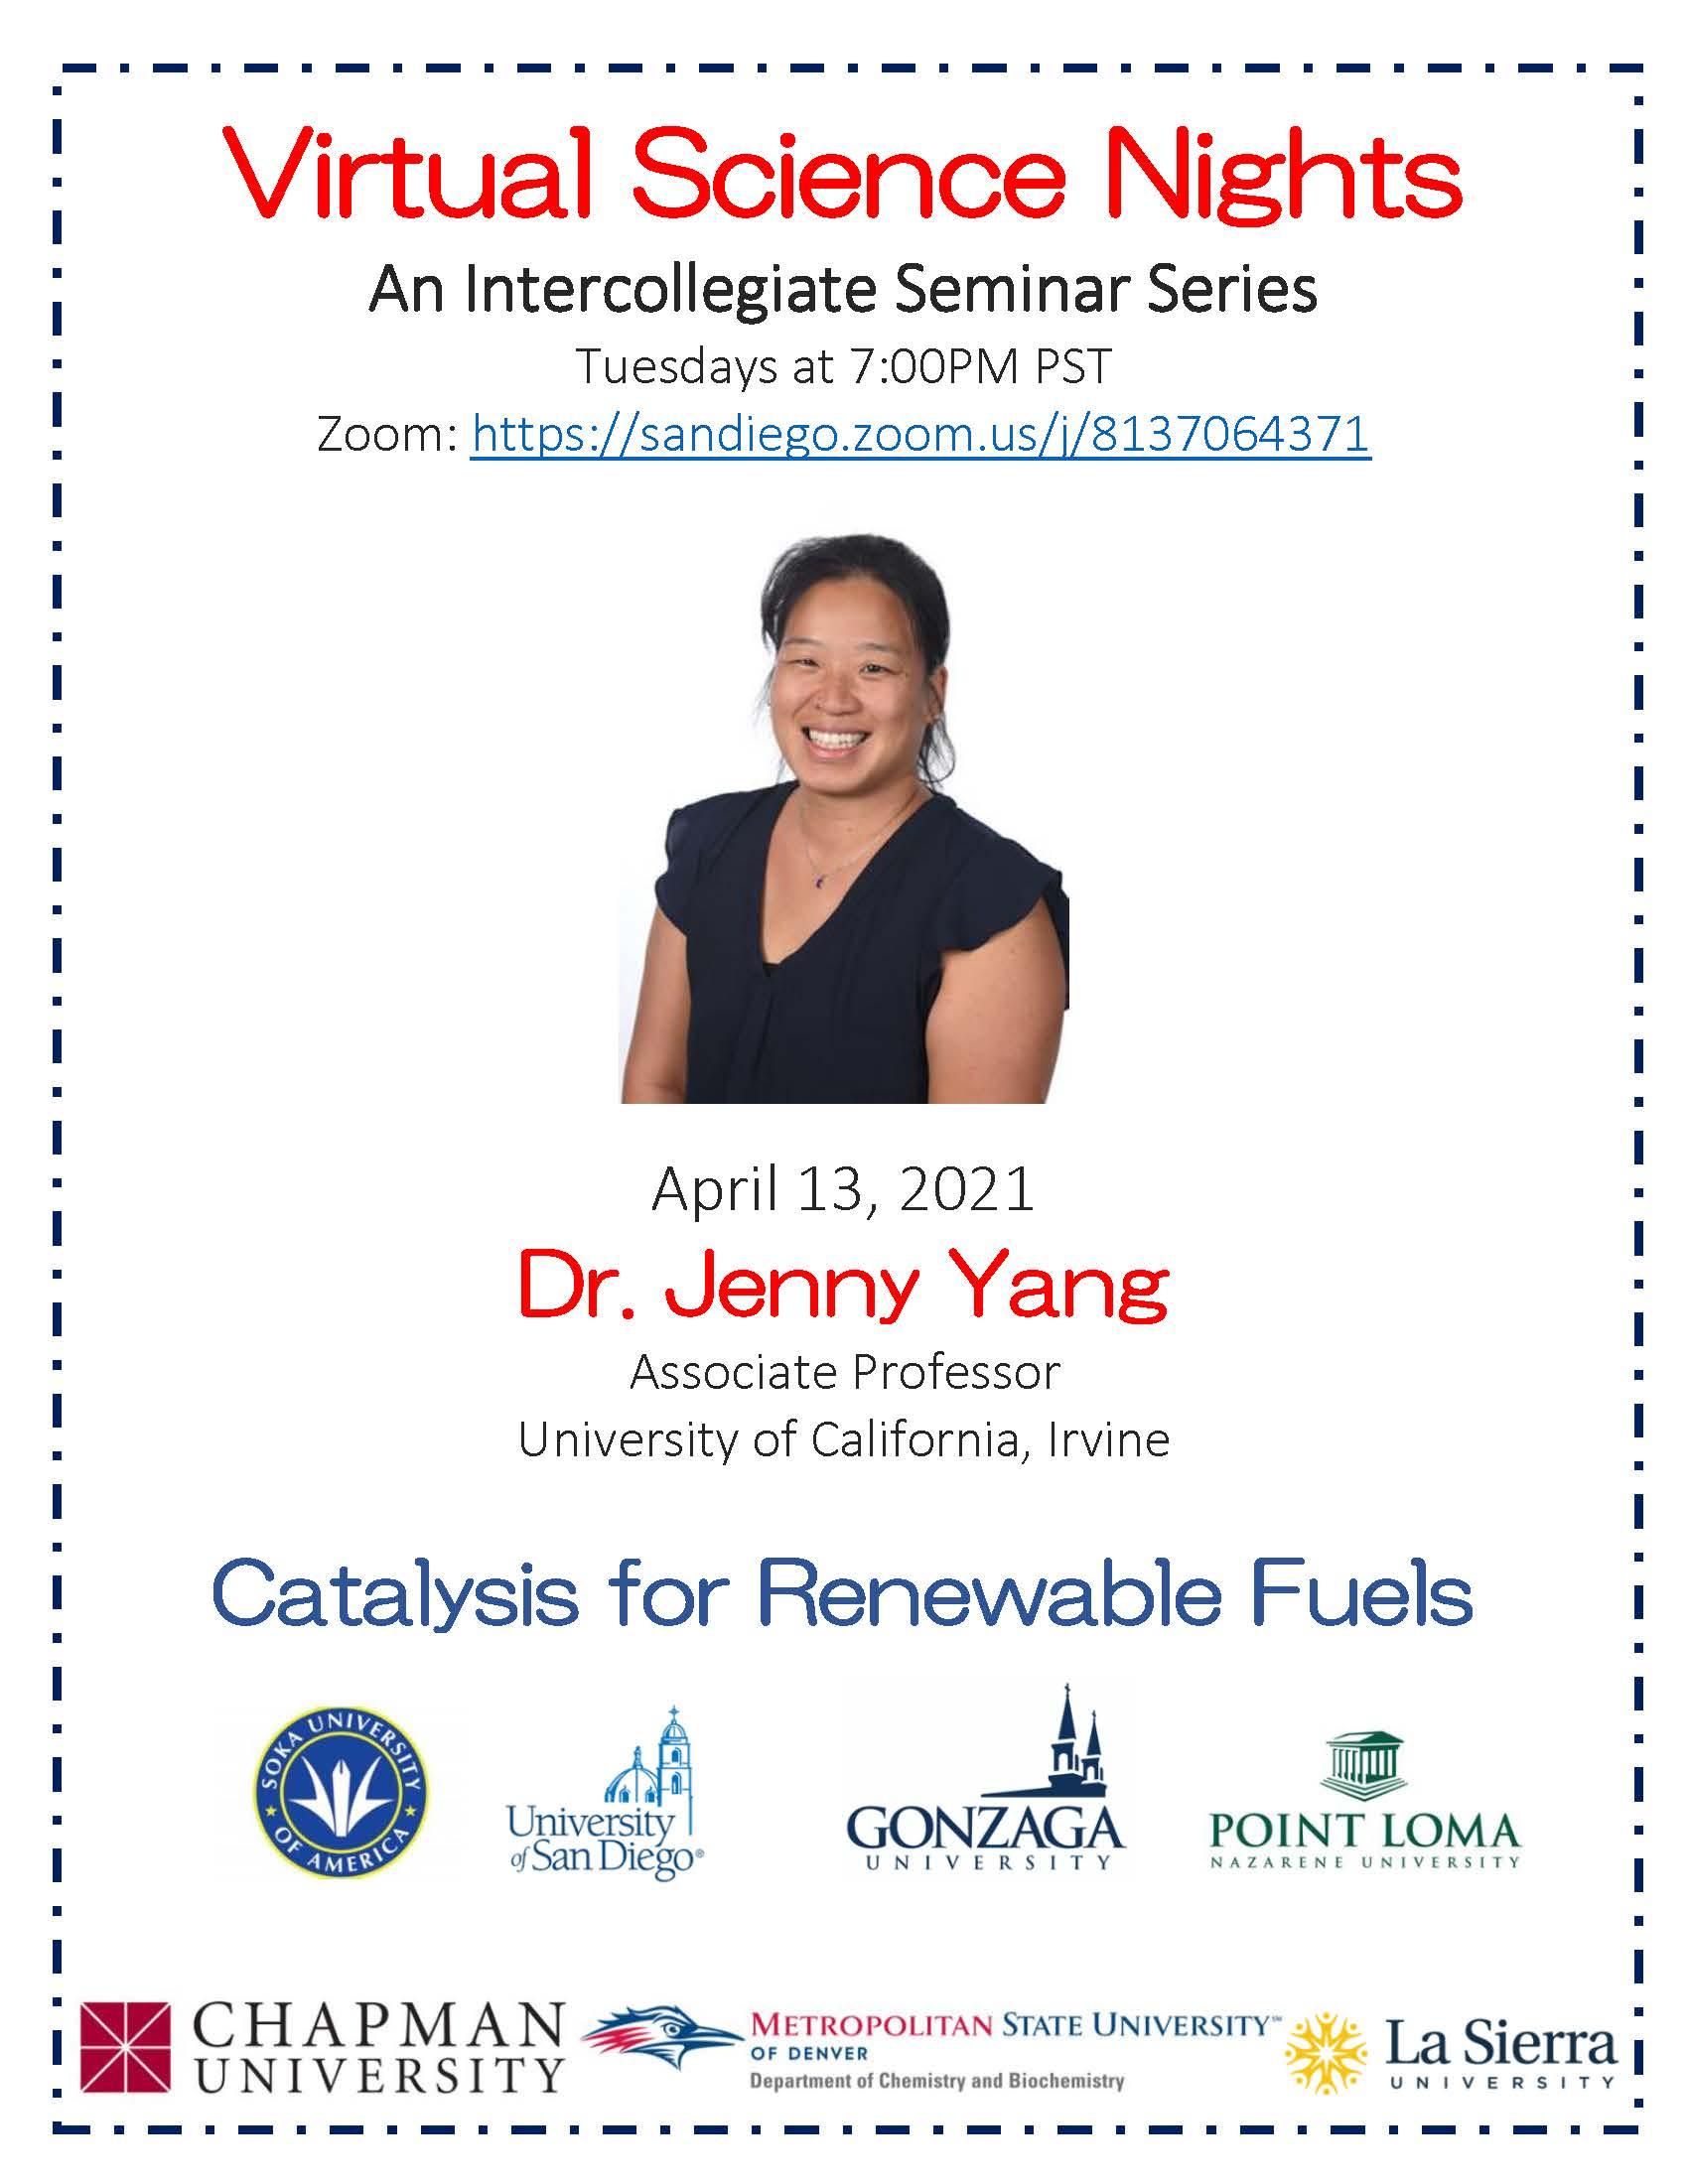 Seminar Flyer - Yang